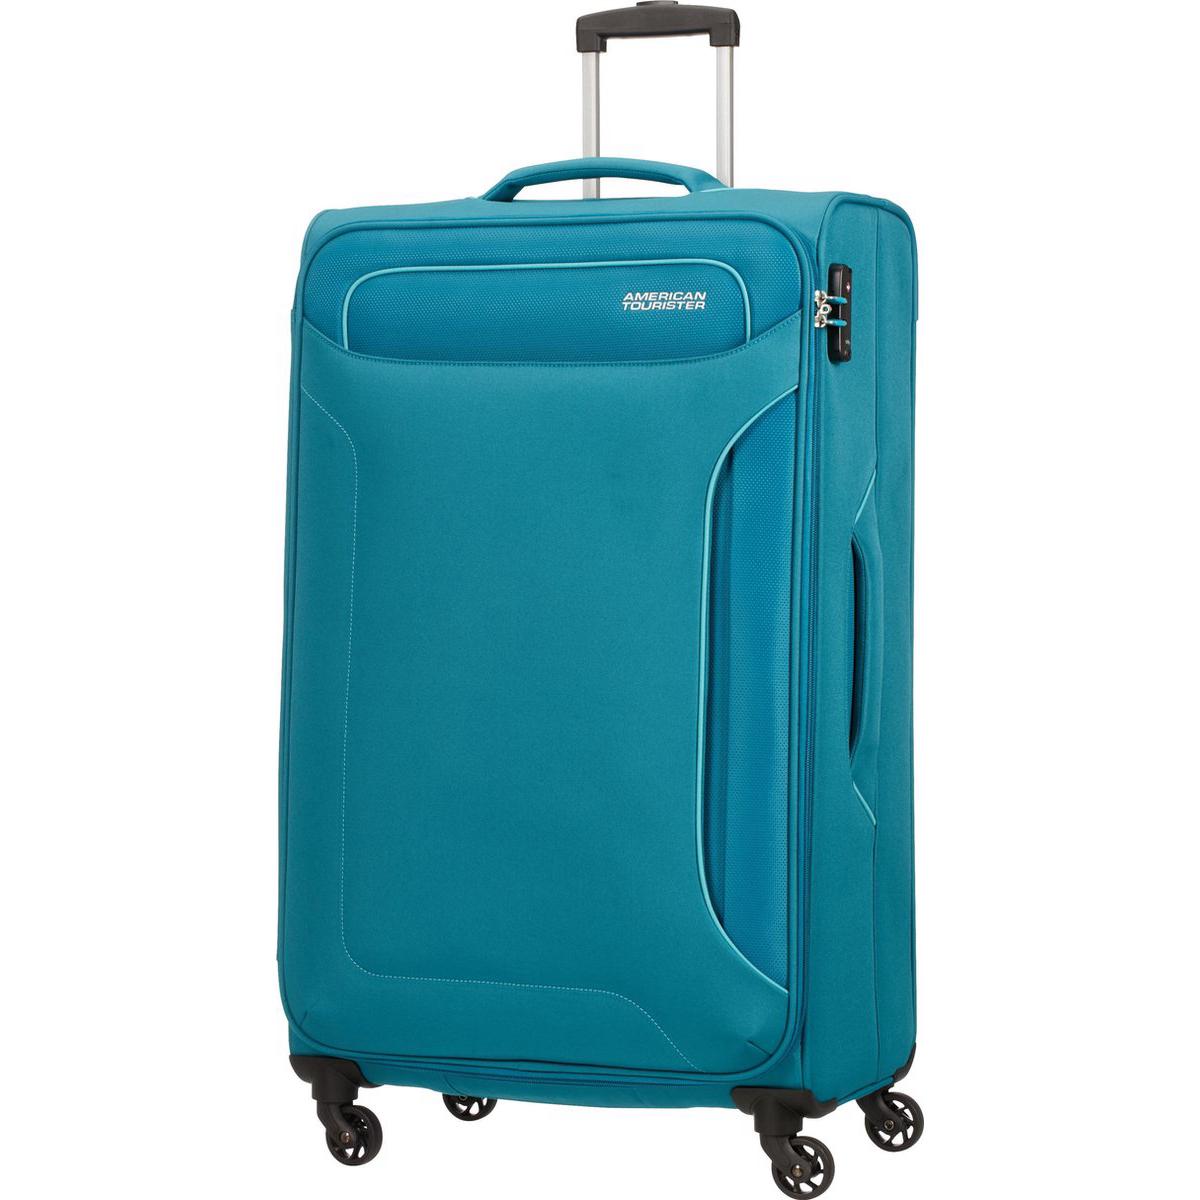 Фото - Чемодан American Tourister 4-х колесный сине-зеленый 46,5х32х79,5 см чемодан american tourister 4 х колесный бирюзовый 40х20х55 см